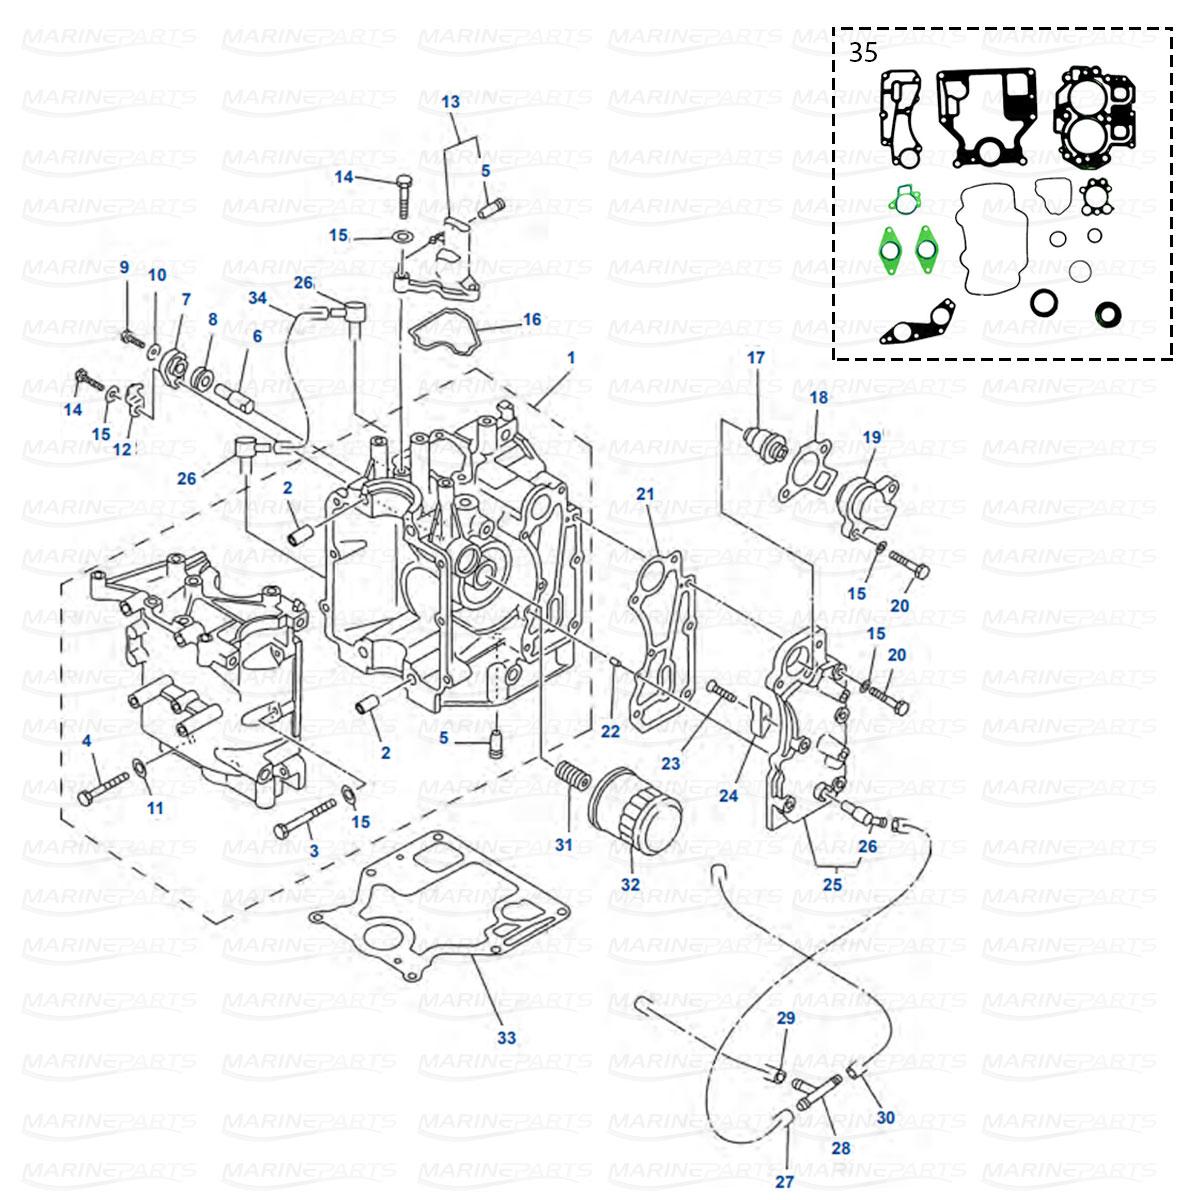 Moottorilohkon varaosia Yamaha F9.9 (2004-06), F13.5 (2003-06), F15 (2003-07)